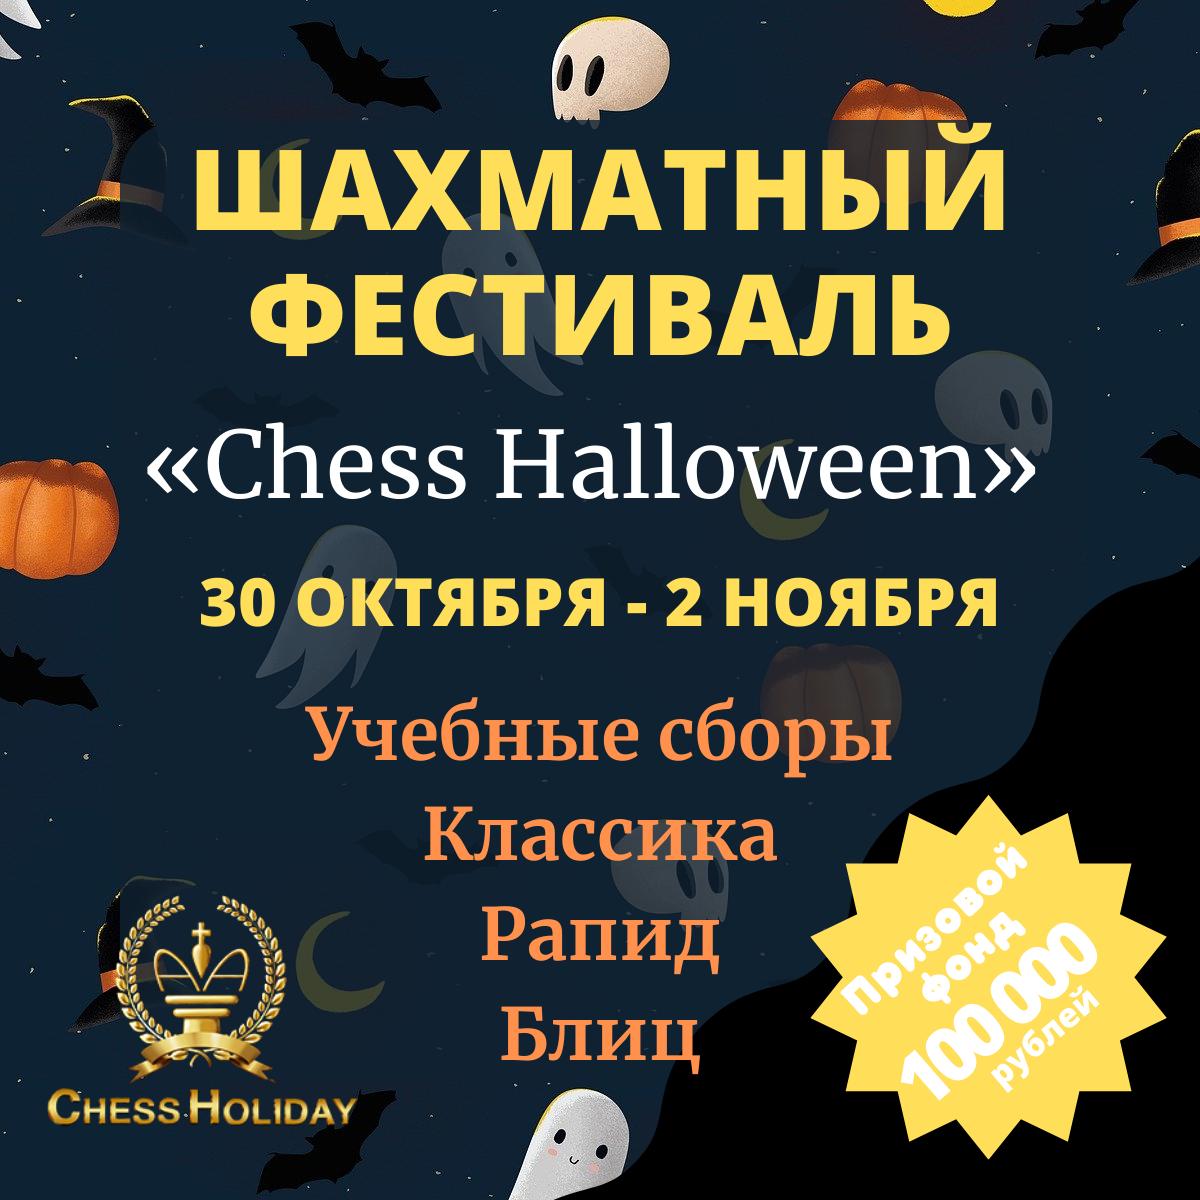 Шахматный турнир Chess Halloween 2021